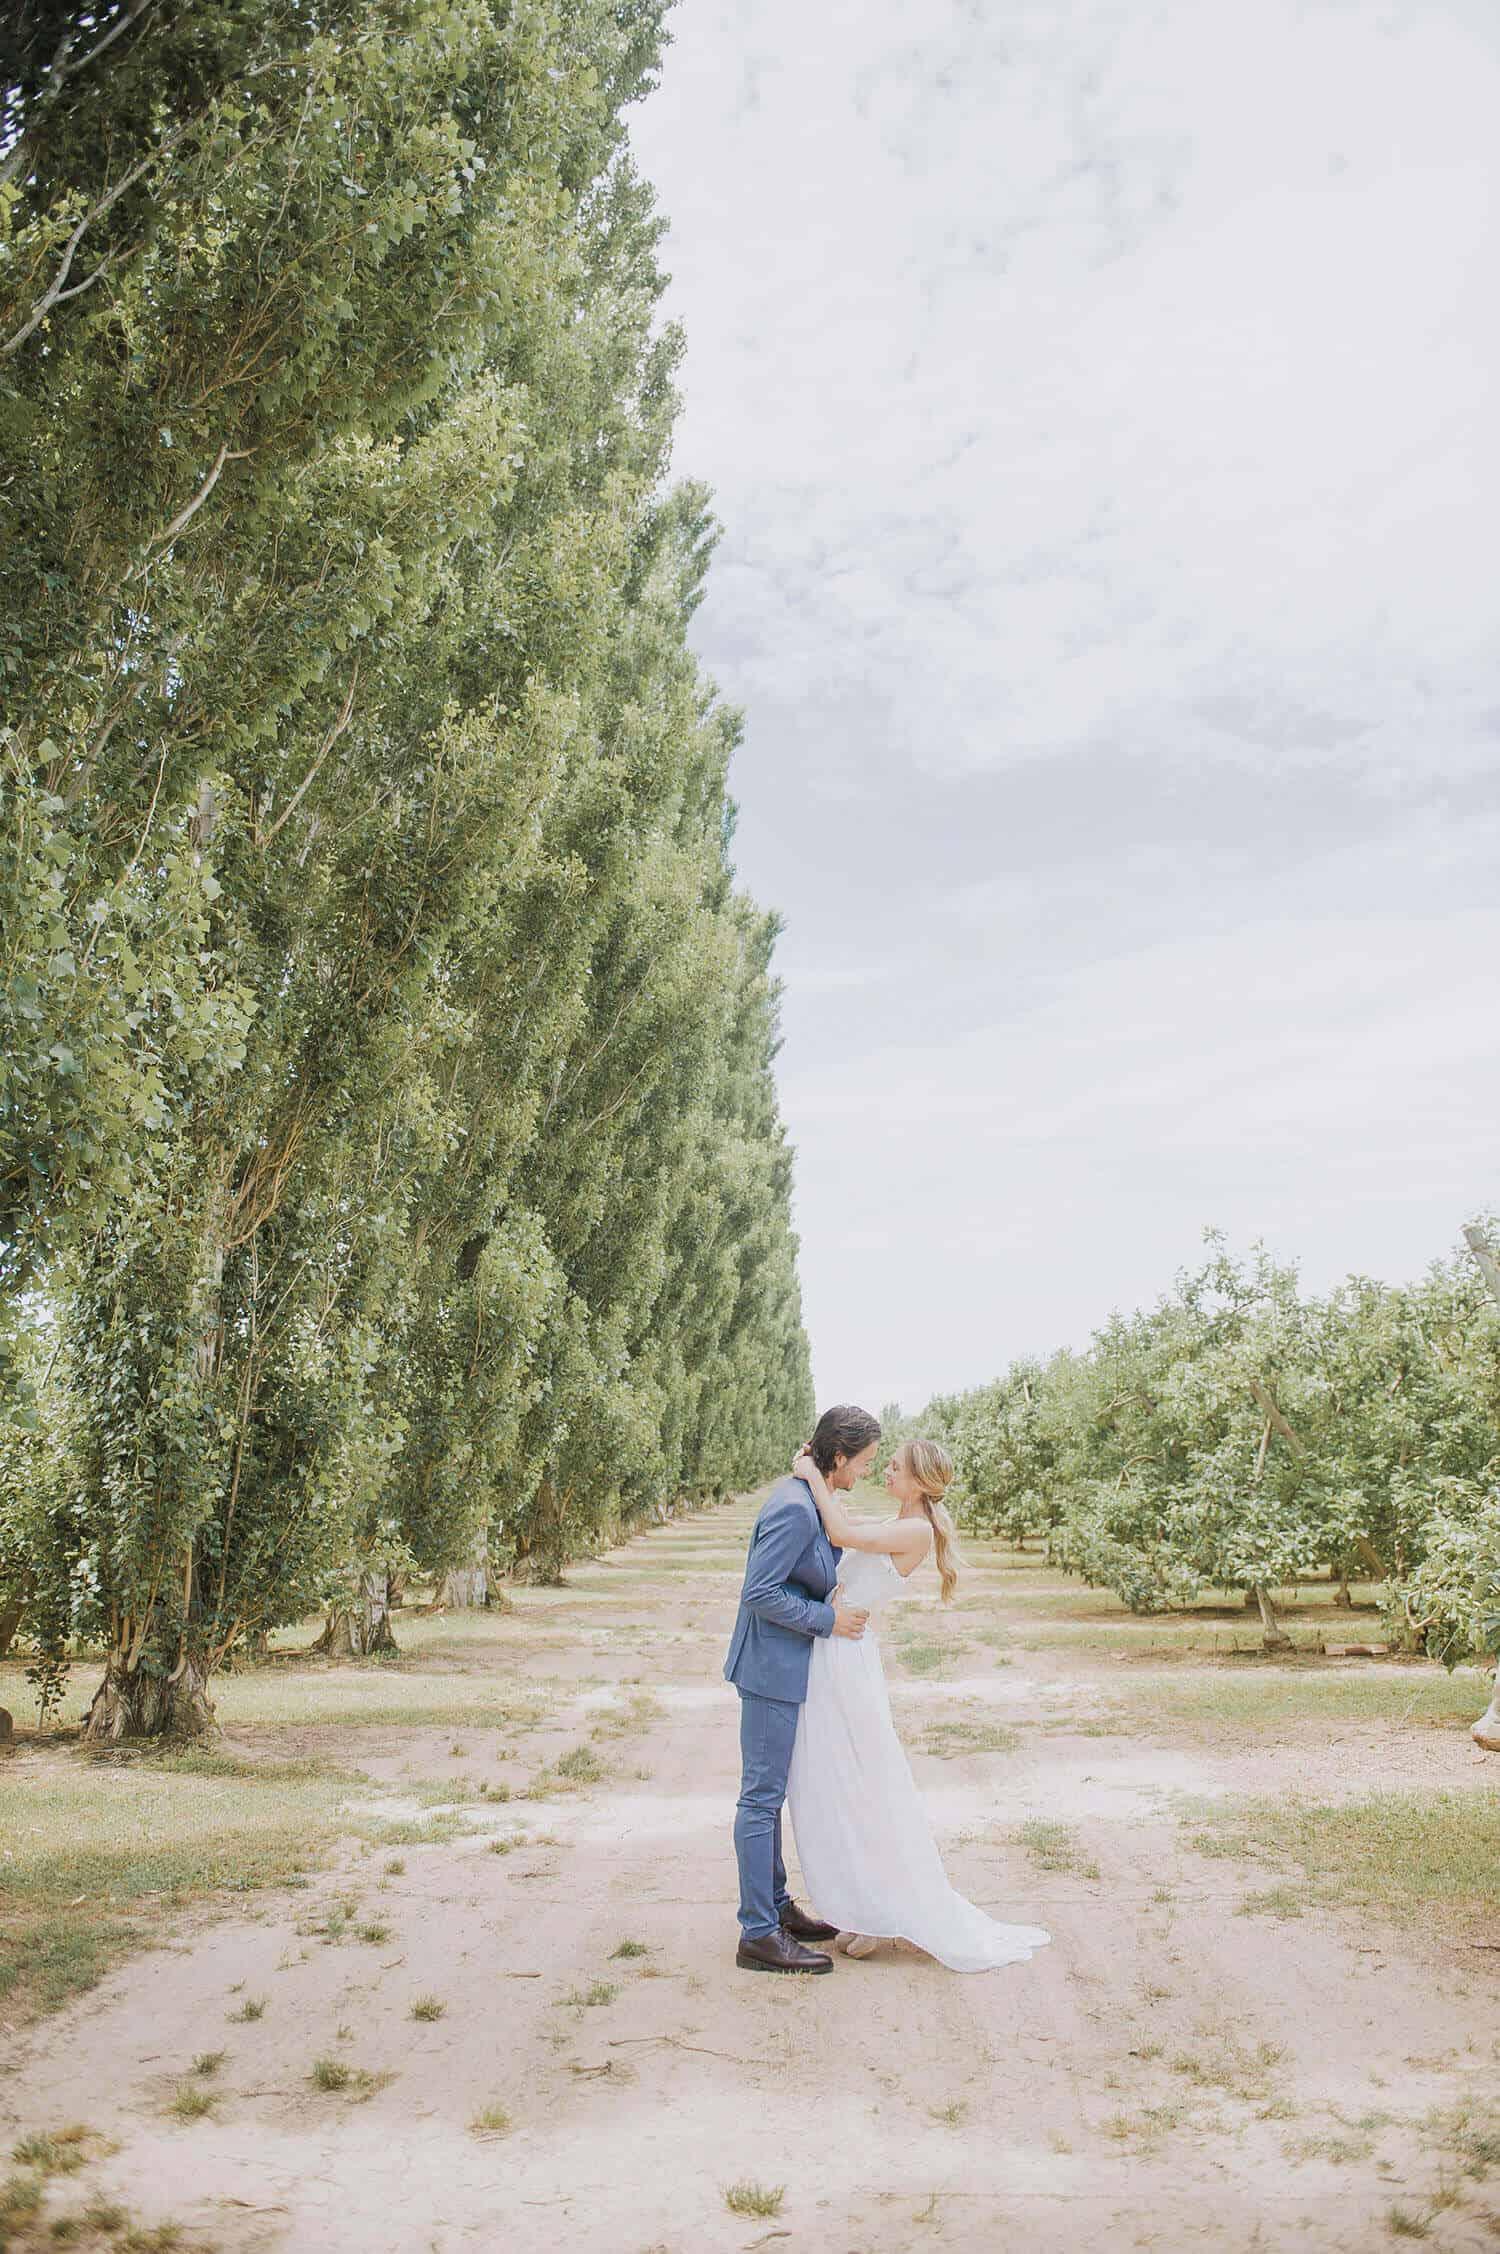 pareja bosque bodas castillo cortal gran